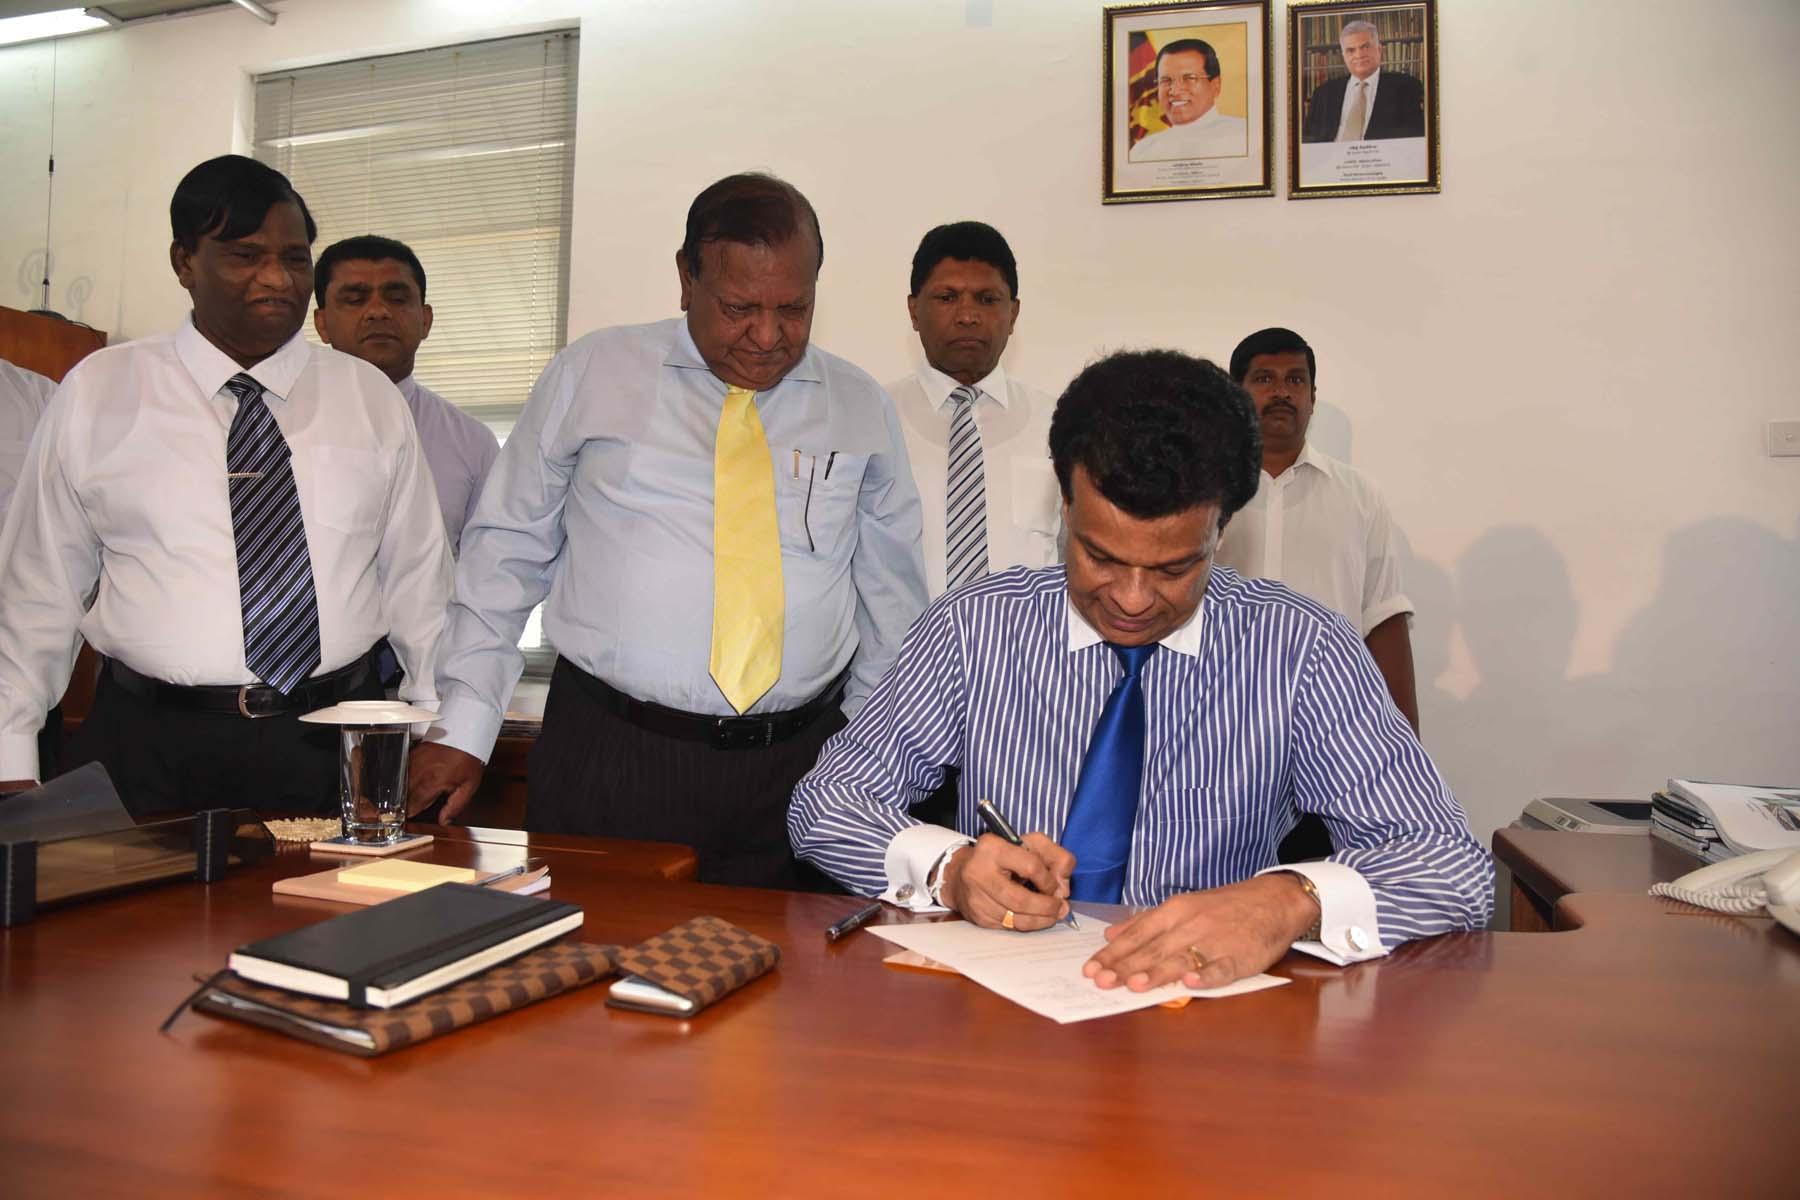 Dr. Parakrama Dissanayake assumes duties as the Chairman of Sri Lanka Ports Authority (SLPA)